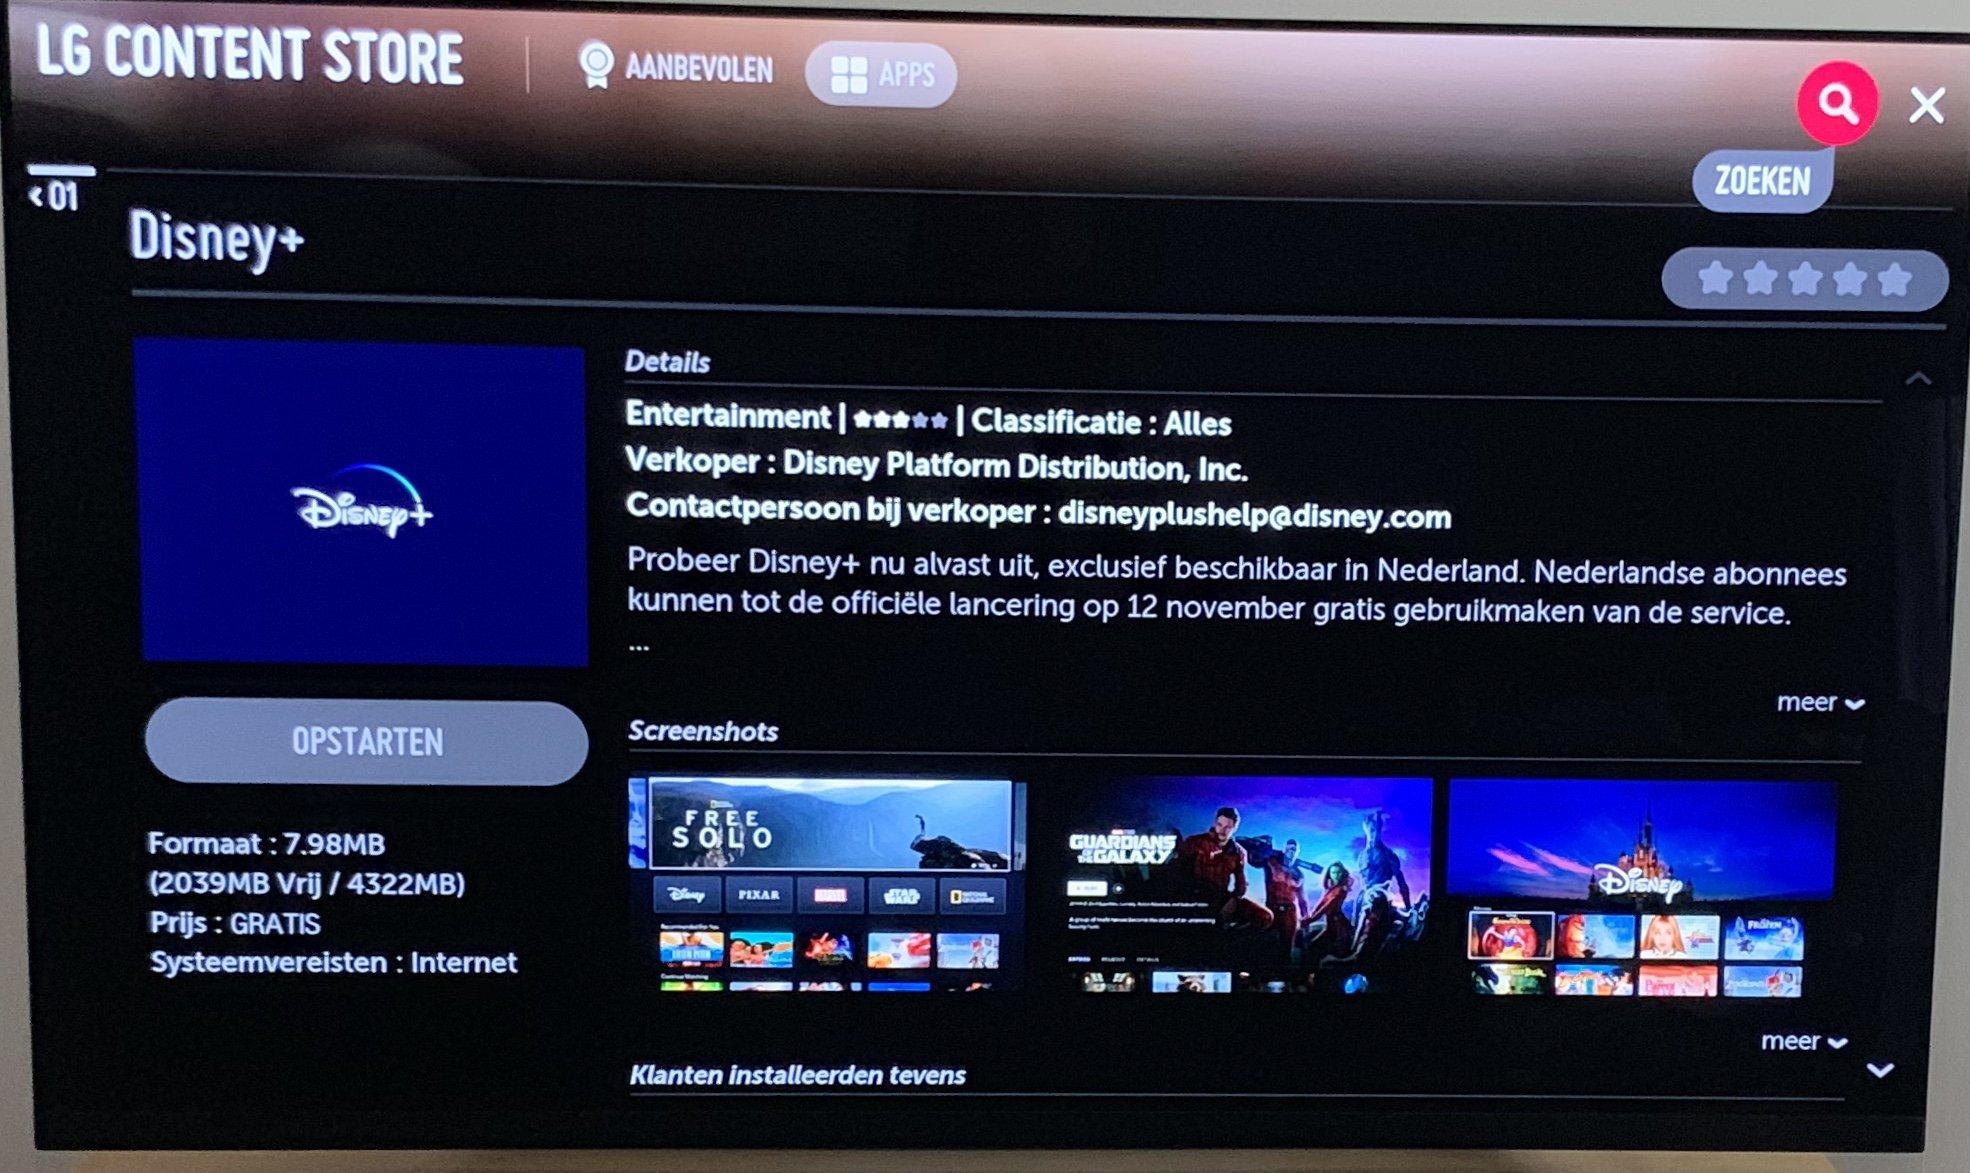 Disney Plus on LG webOS TVs - LG webOS Wish List - LG webOS